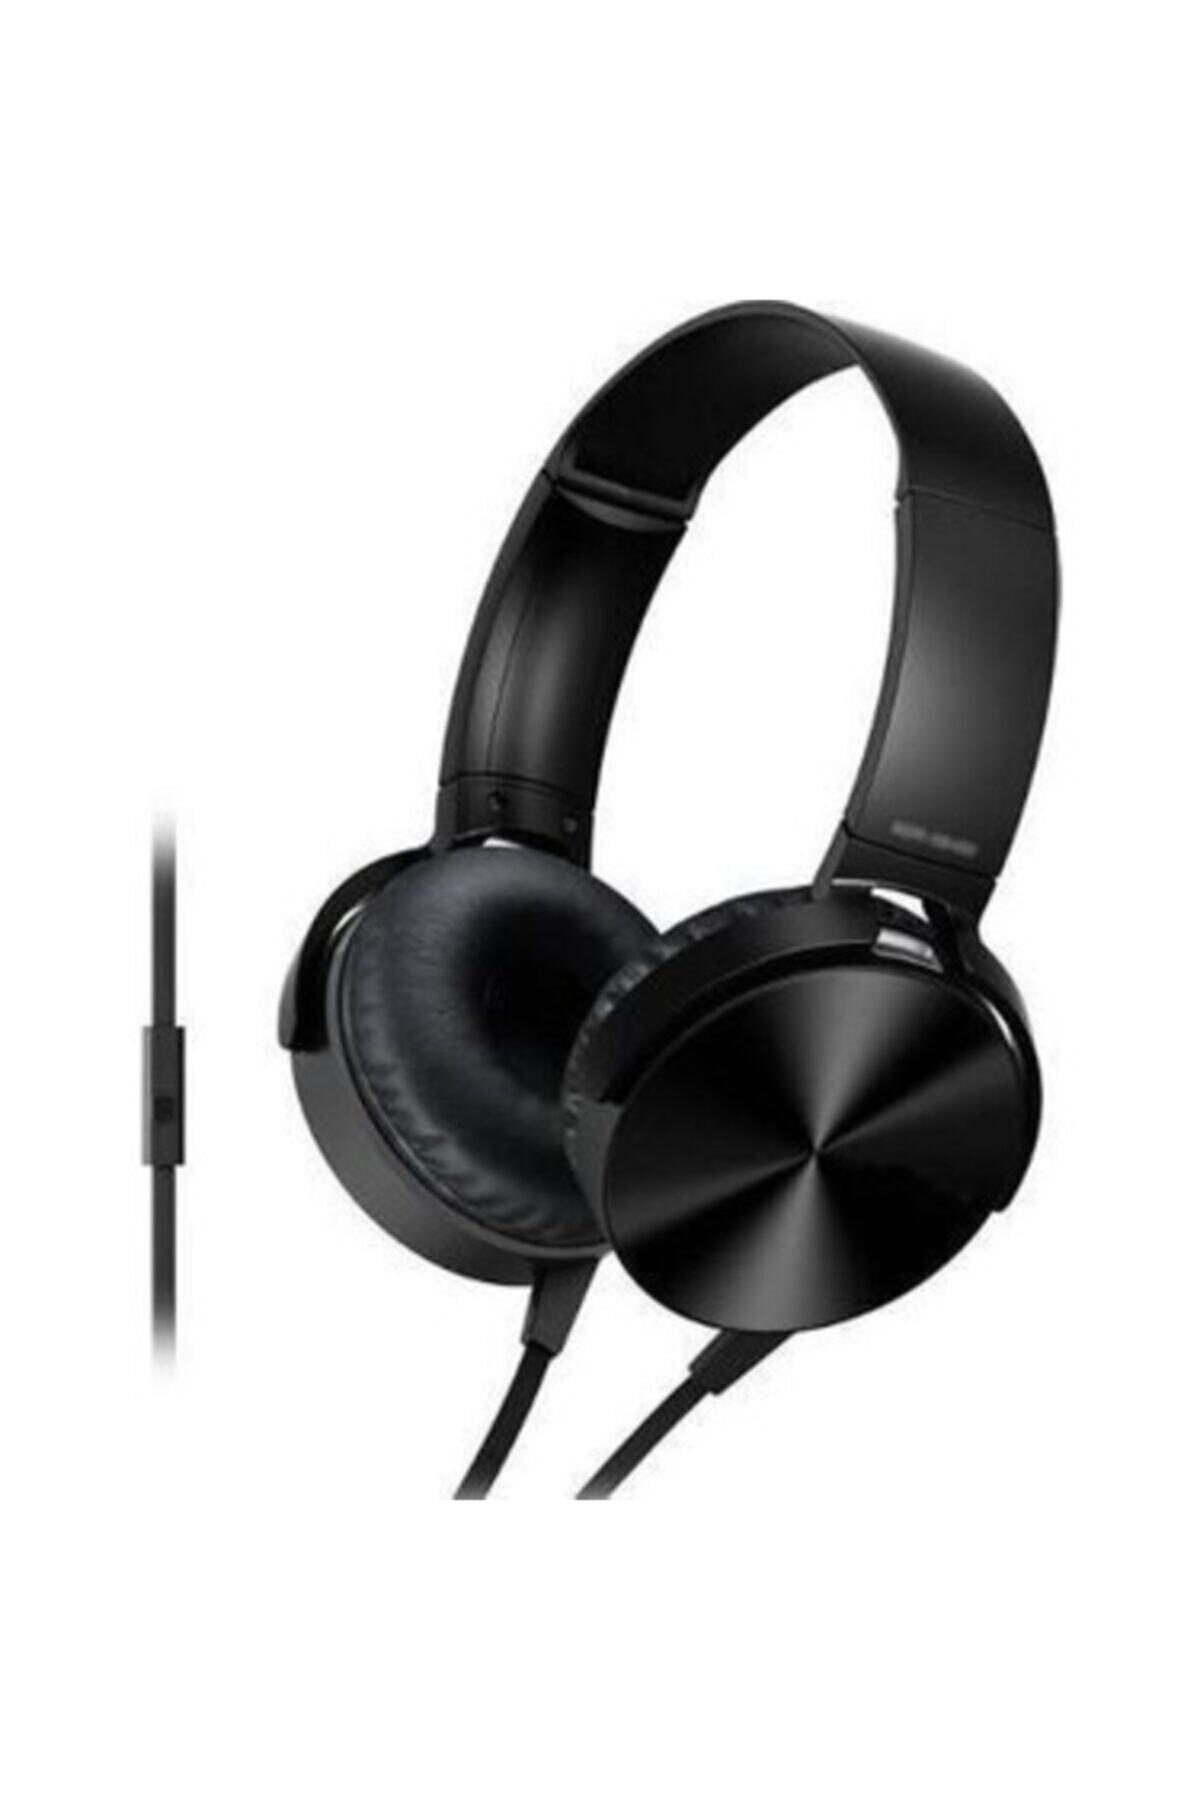 OKMORE Siyah Kafa Üstü Telefon Oyun Kulaklığı Extra Bass Stereo 1